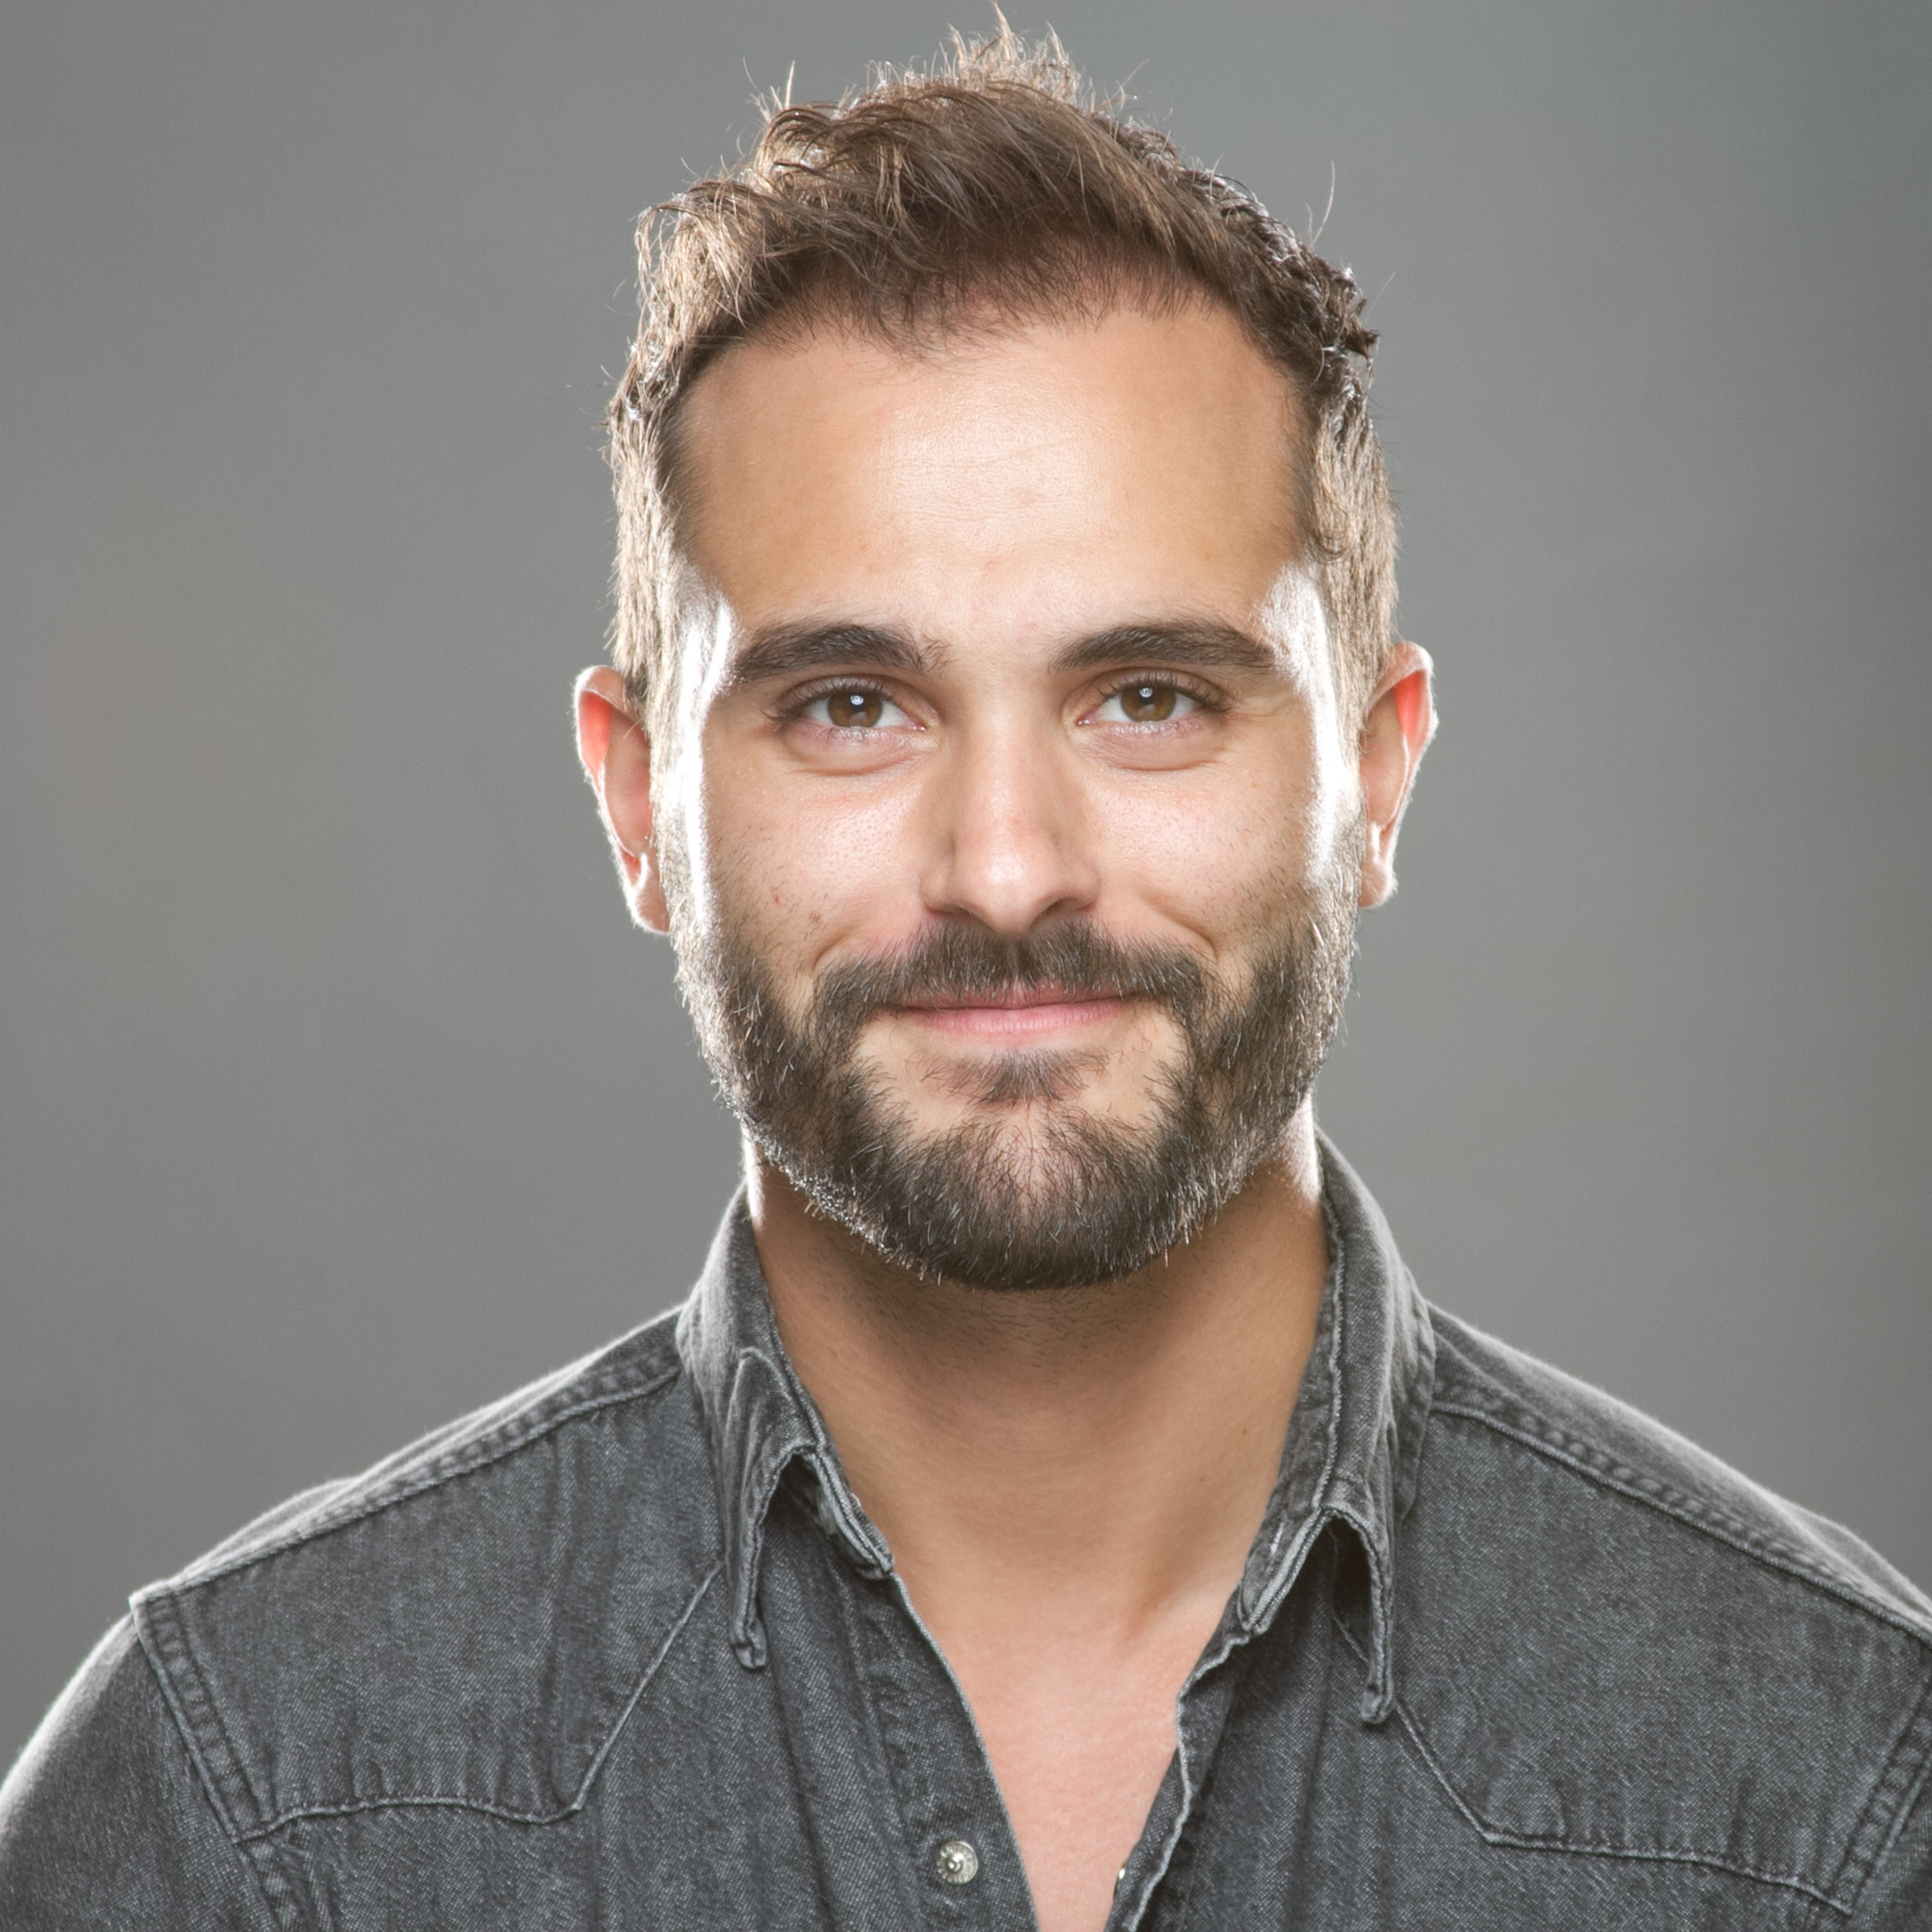 Christian Rozakis